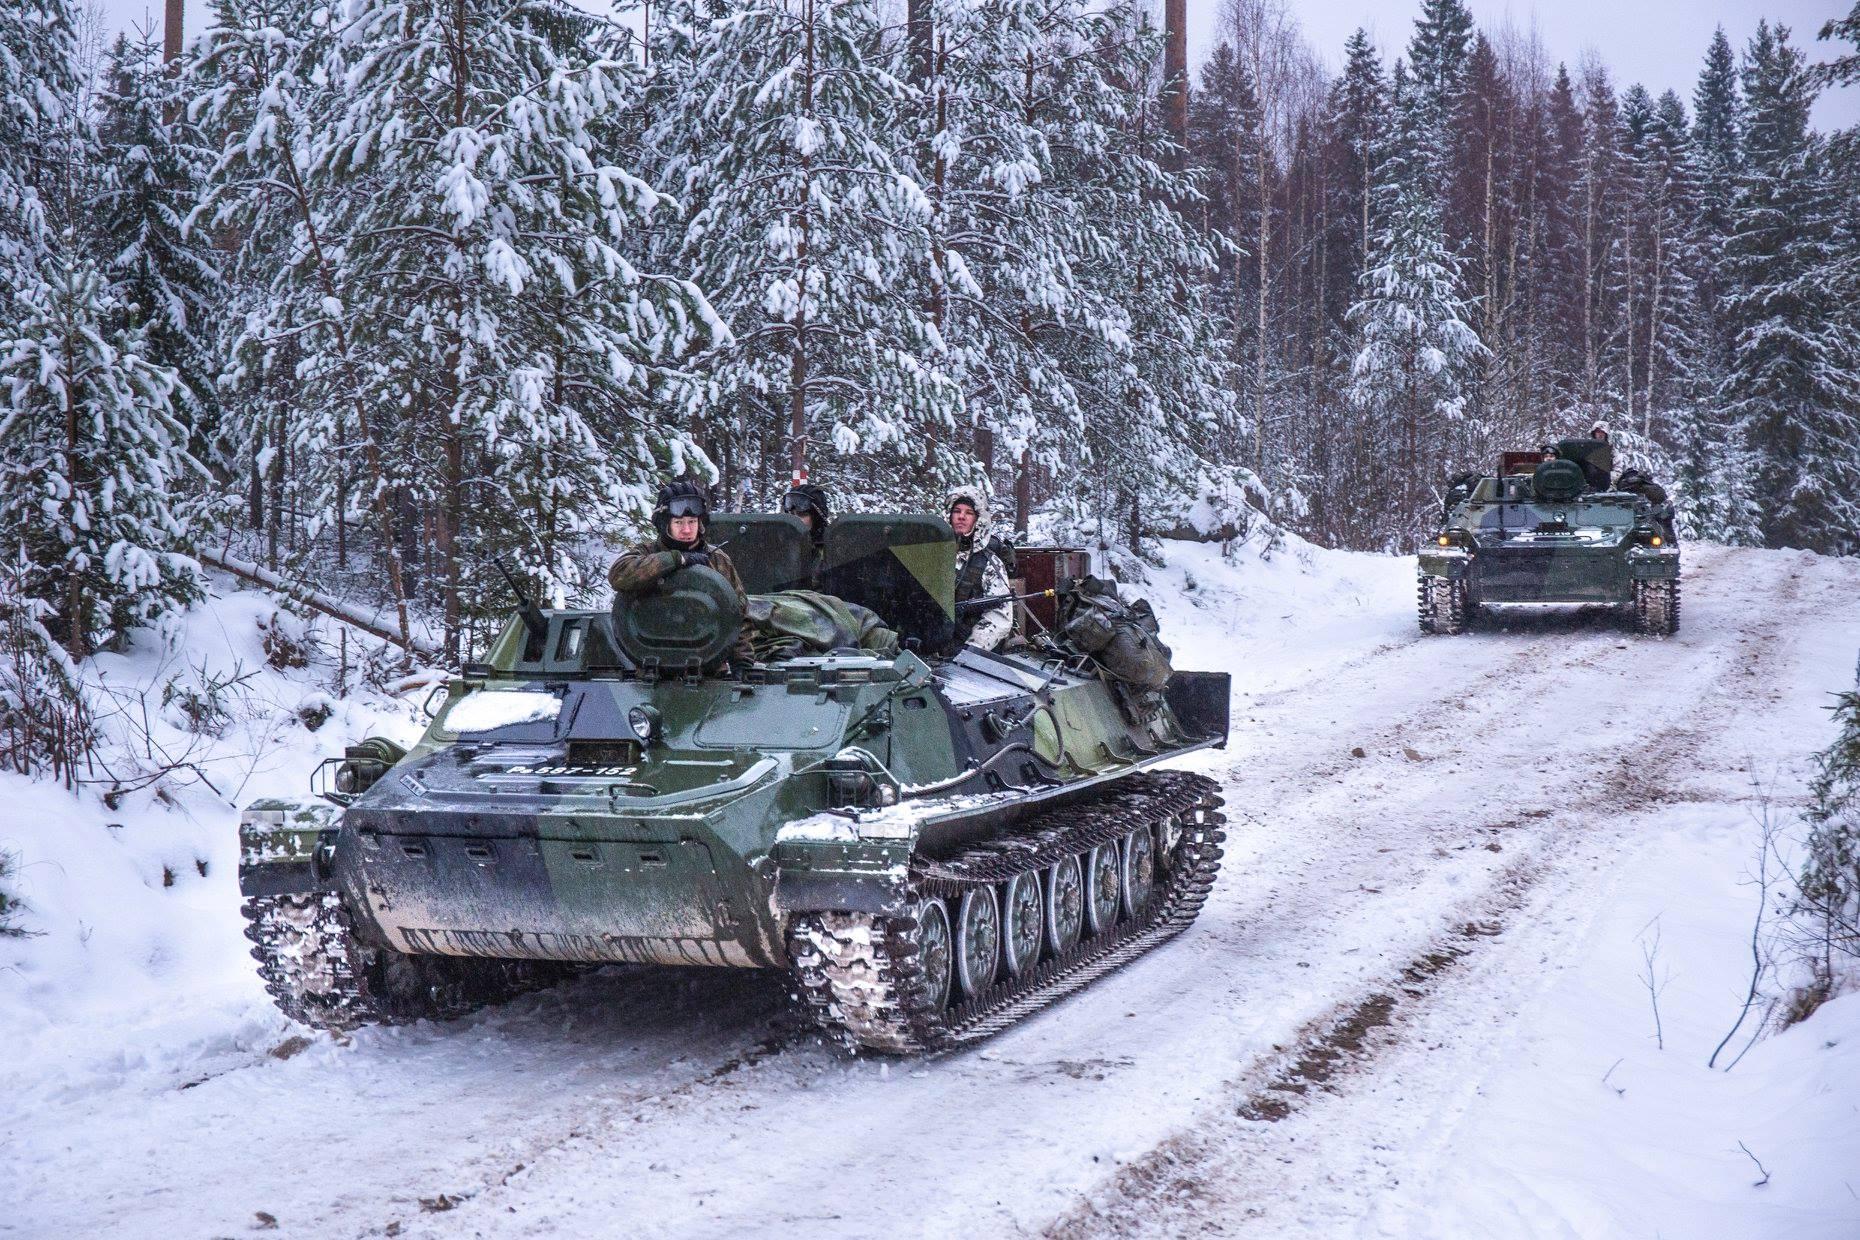 Armée Finlandaise / Finnish Defence Forces / puolustusvoimat - Page 10 47396826_2384280385136813_1032778006478716928_o-jpg